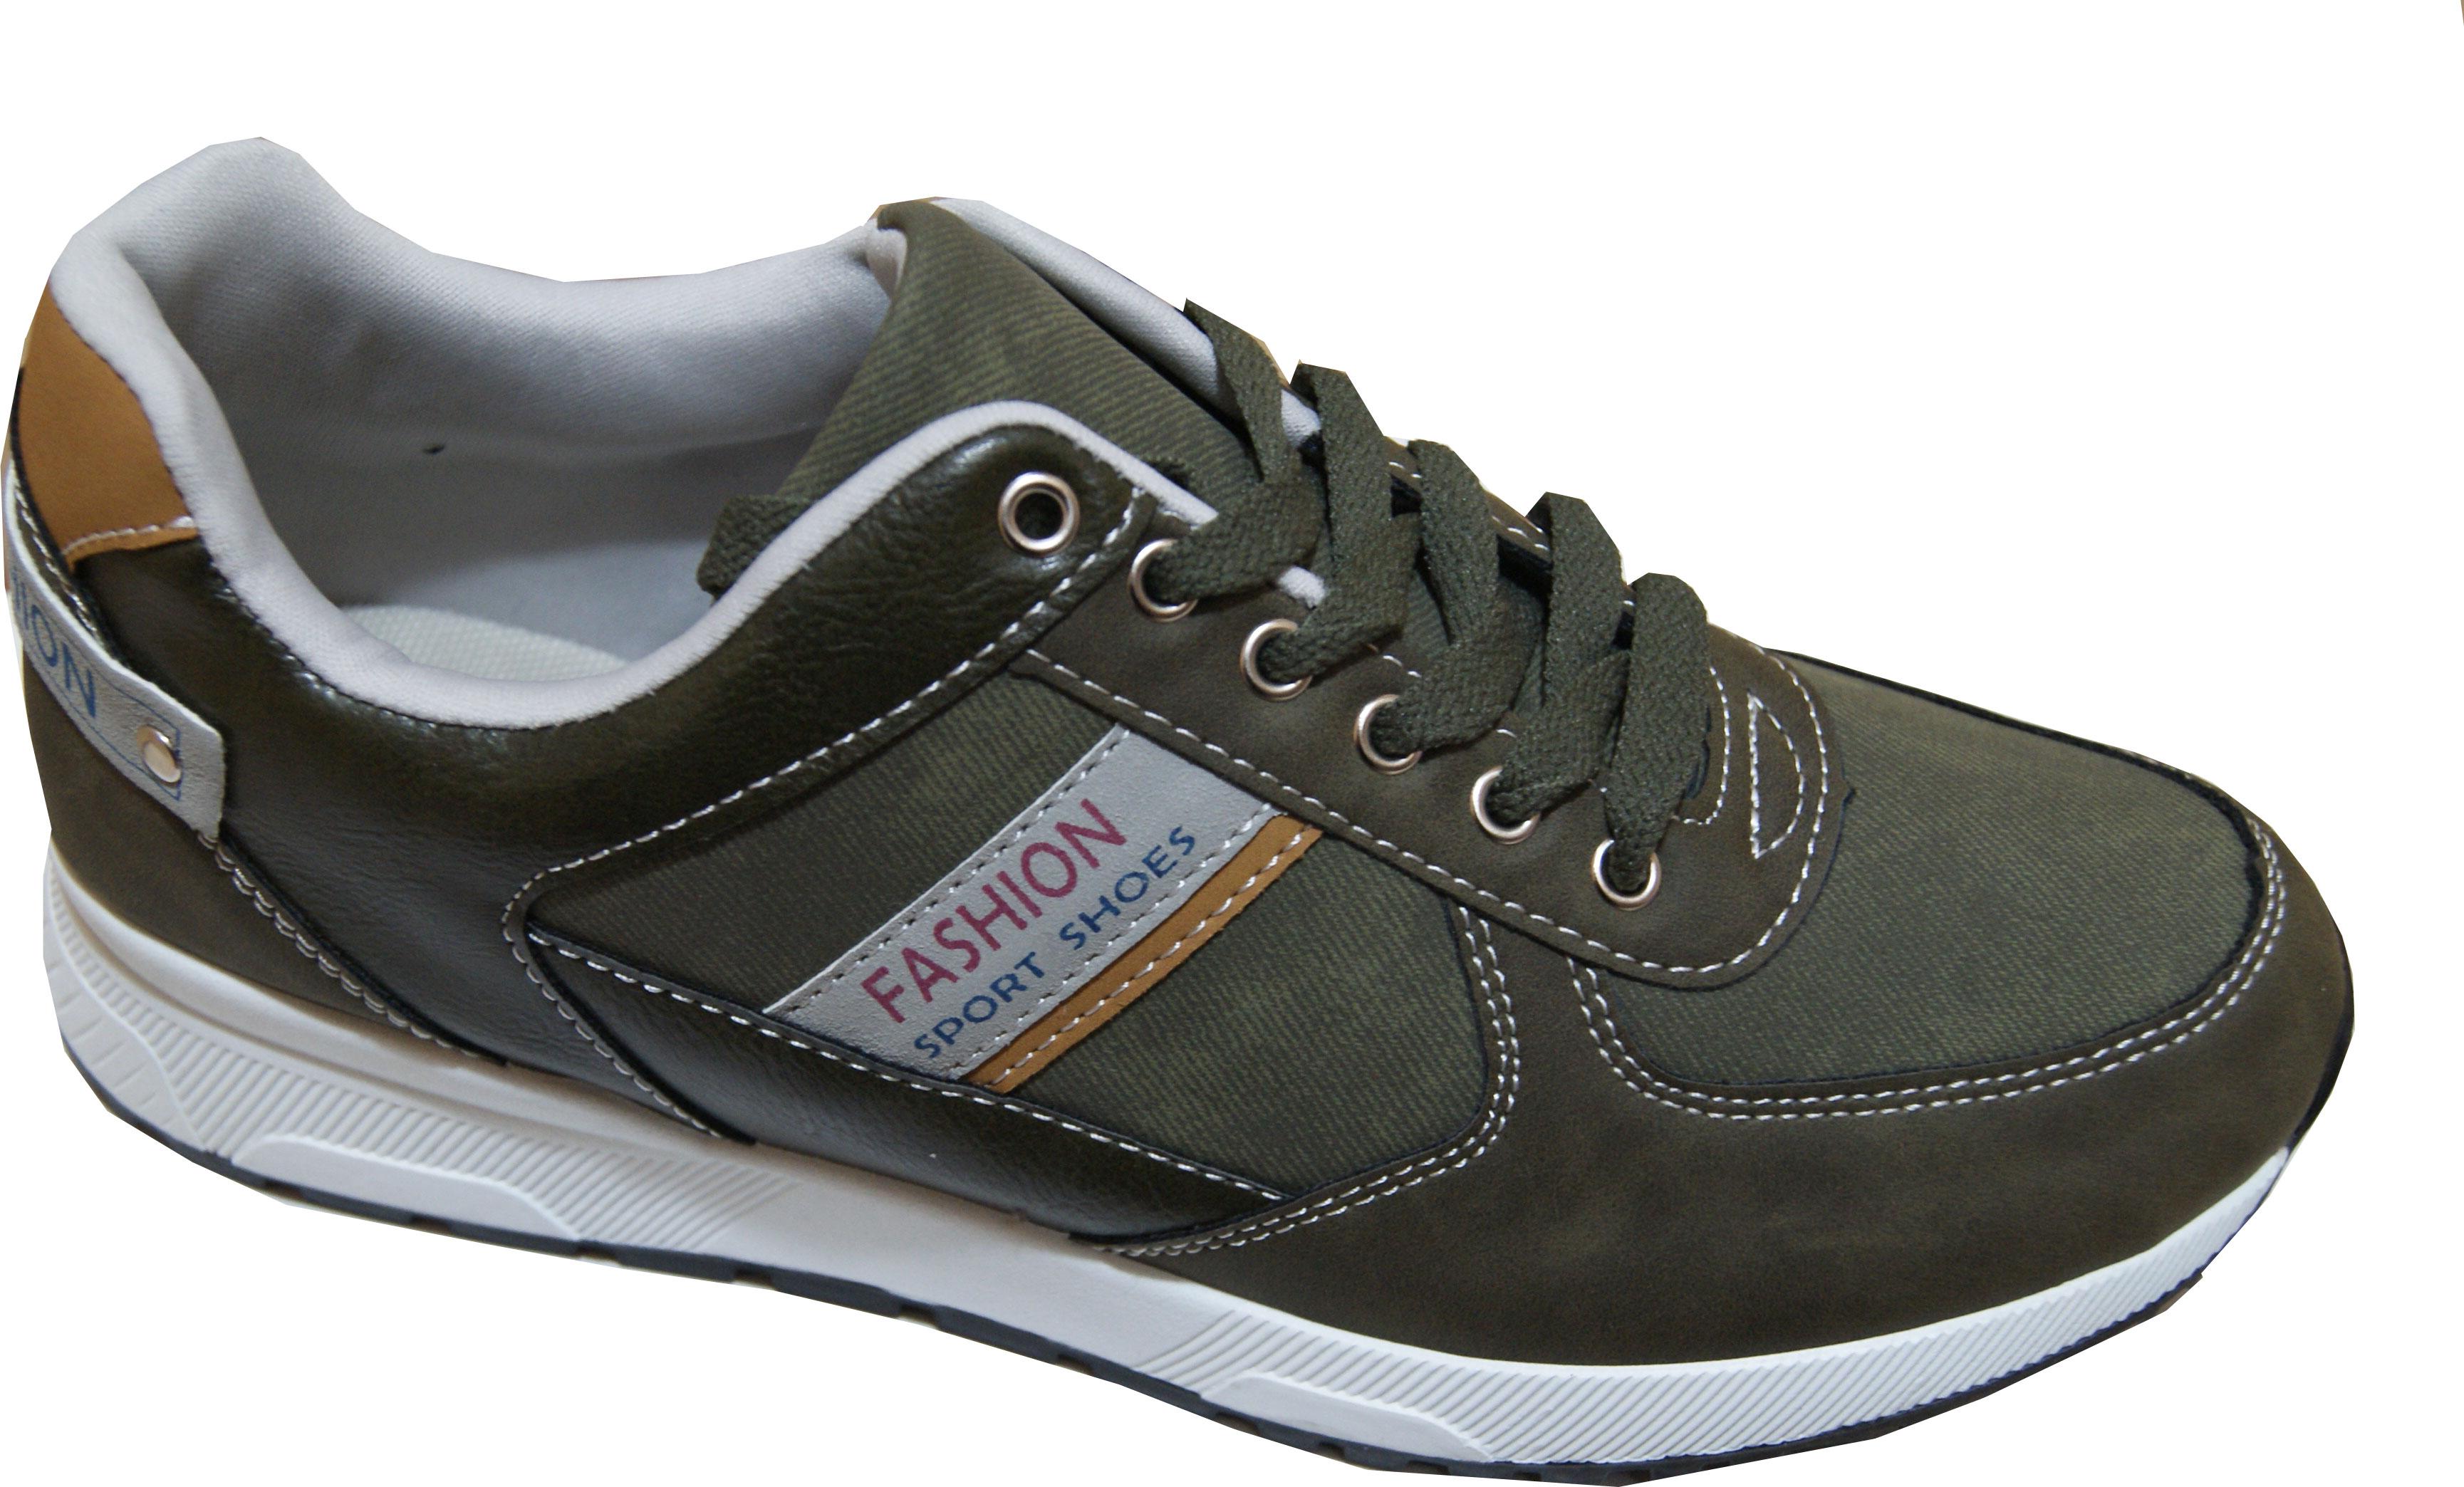 Sneakers ανδρικά Νο 338 - Χακί